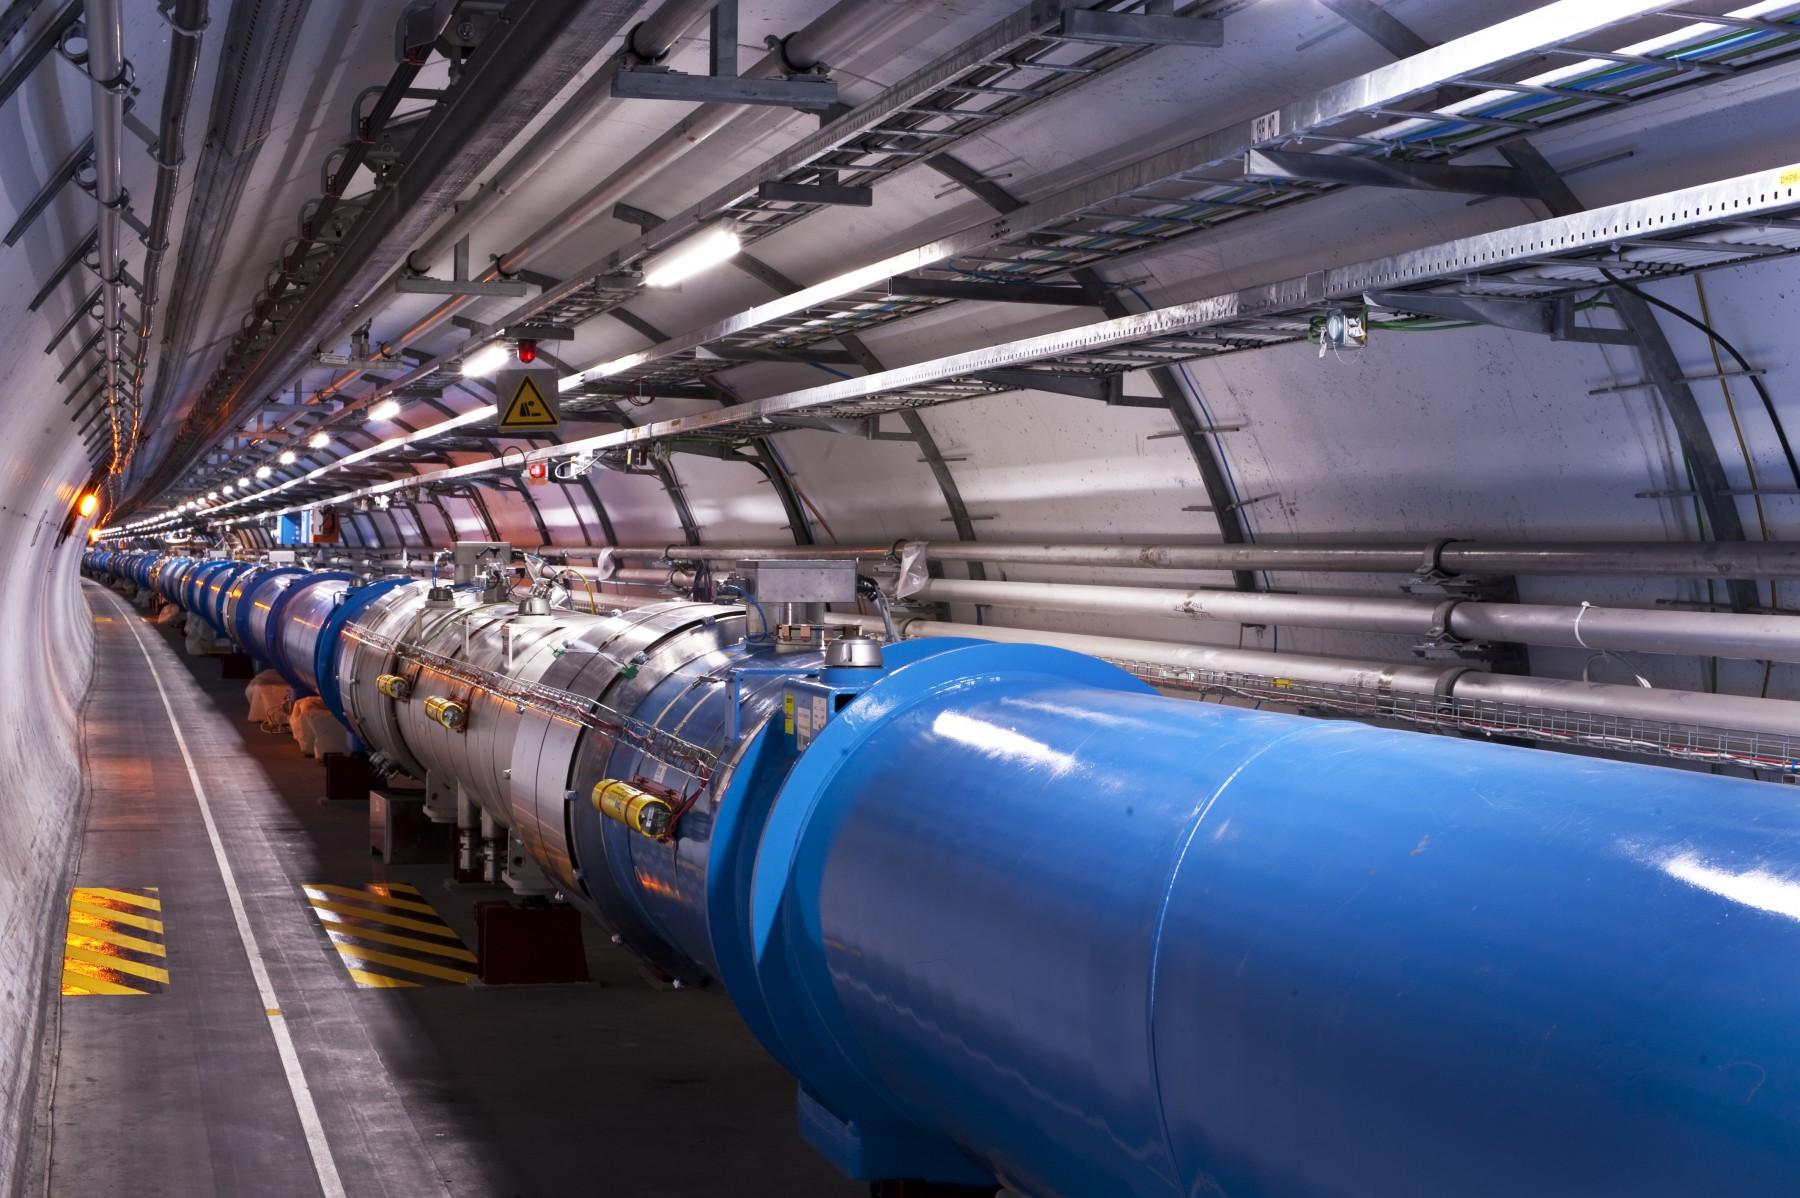 CERN_s_Large_Hadron_Collider